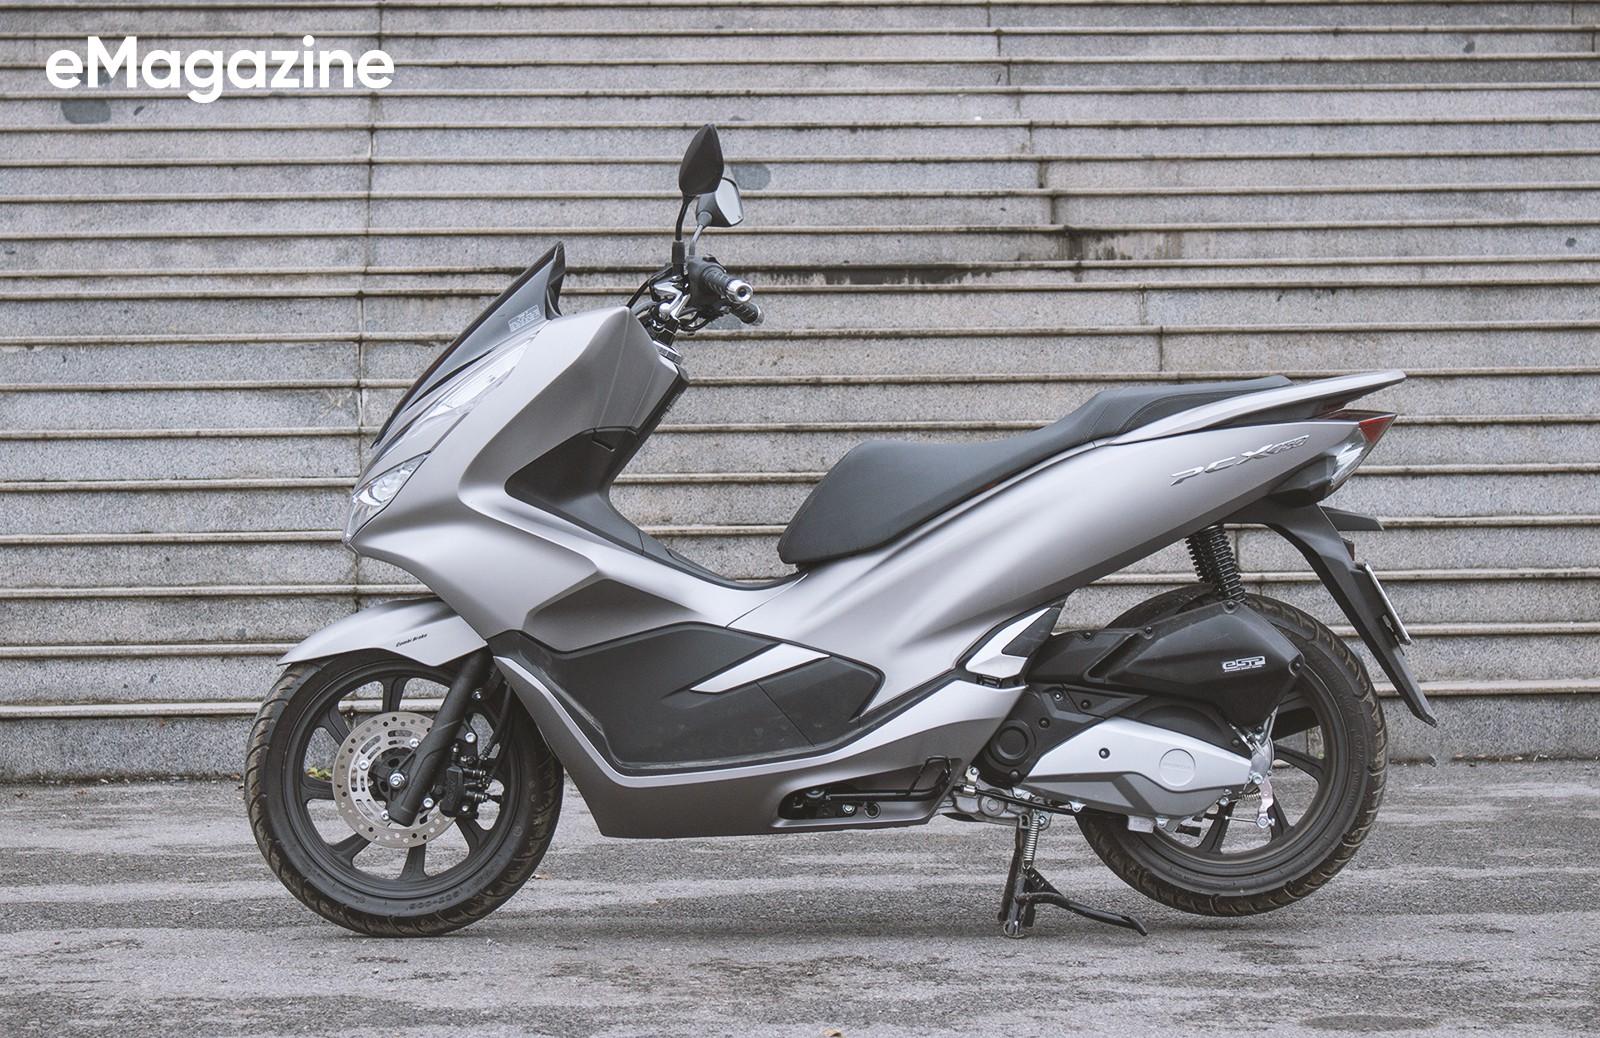 Giới thiệu Honda PCX 150 2018